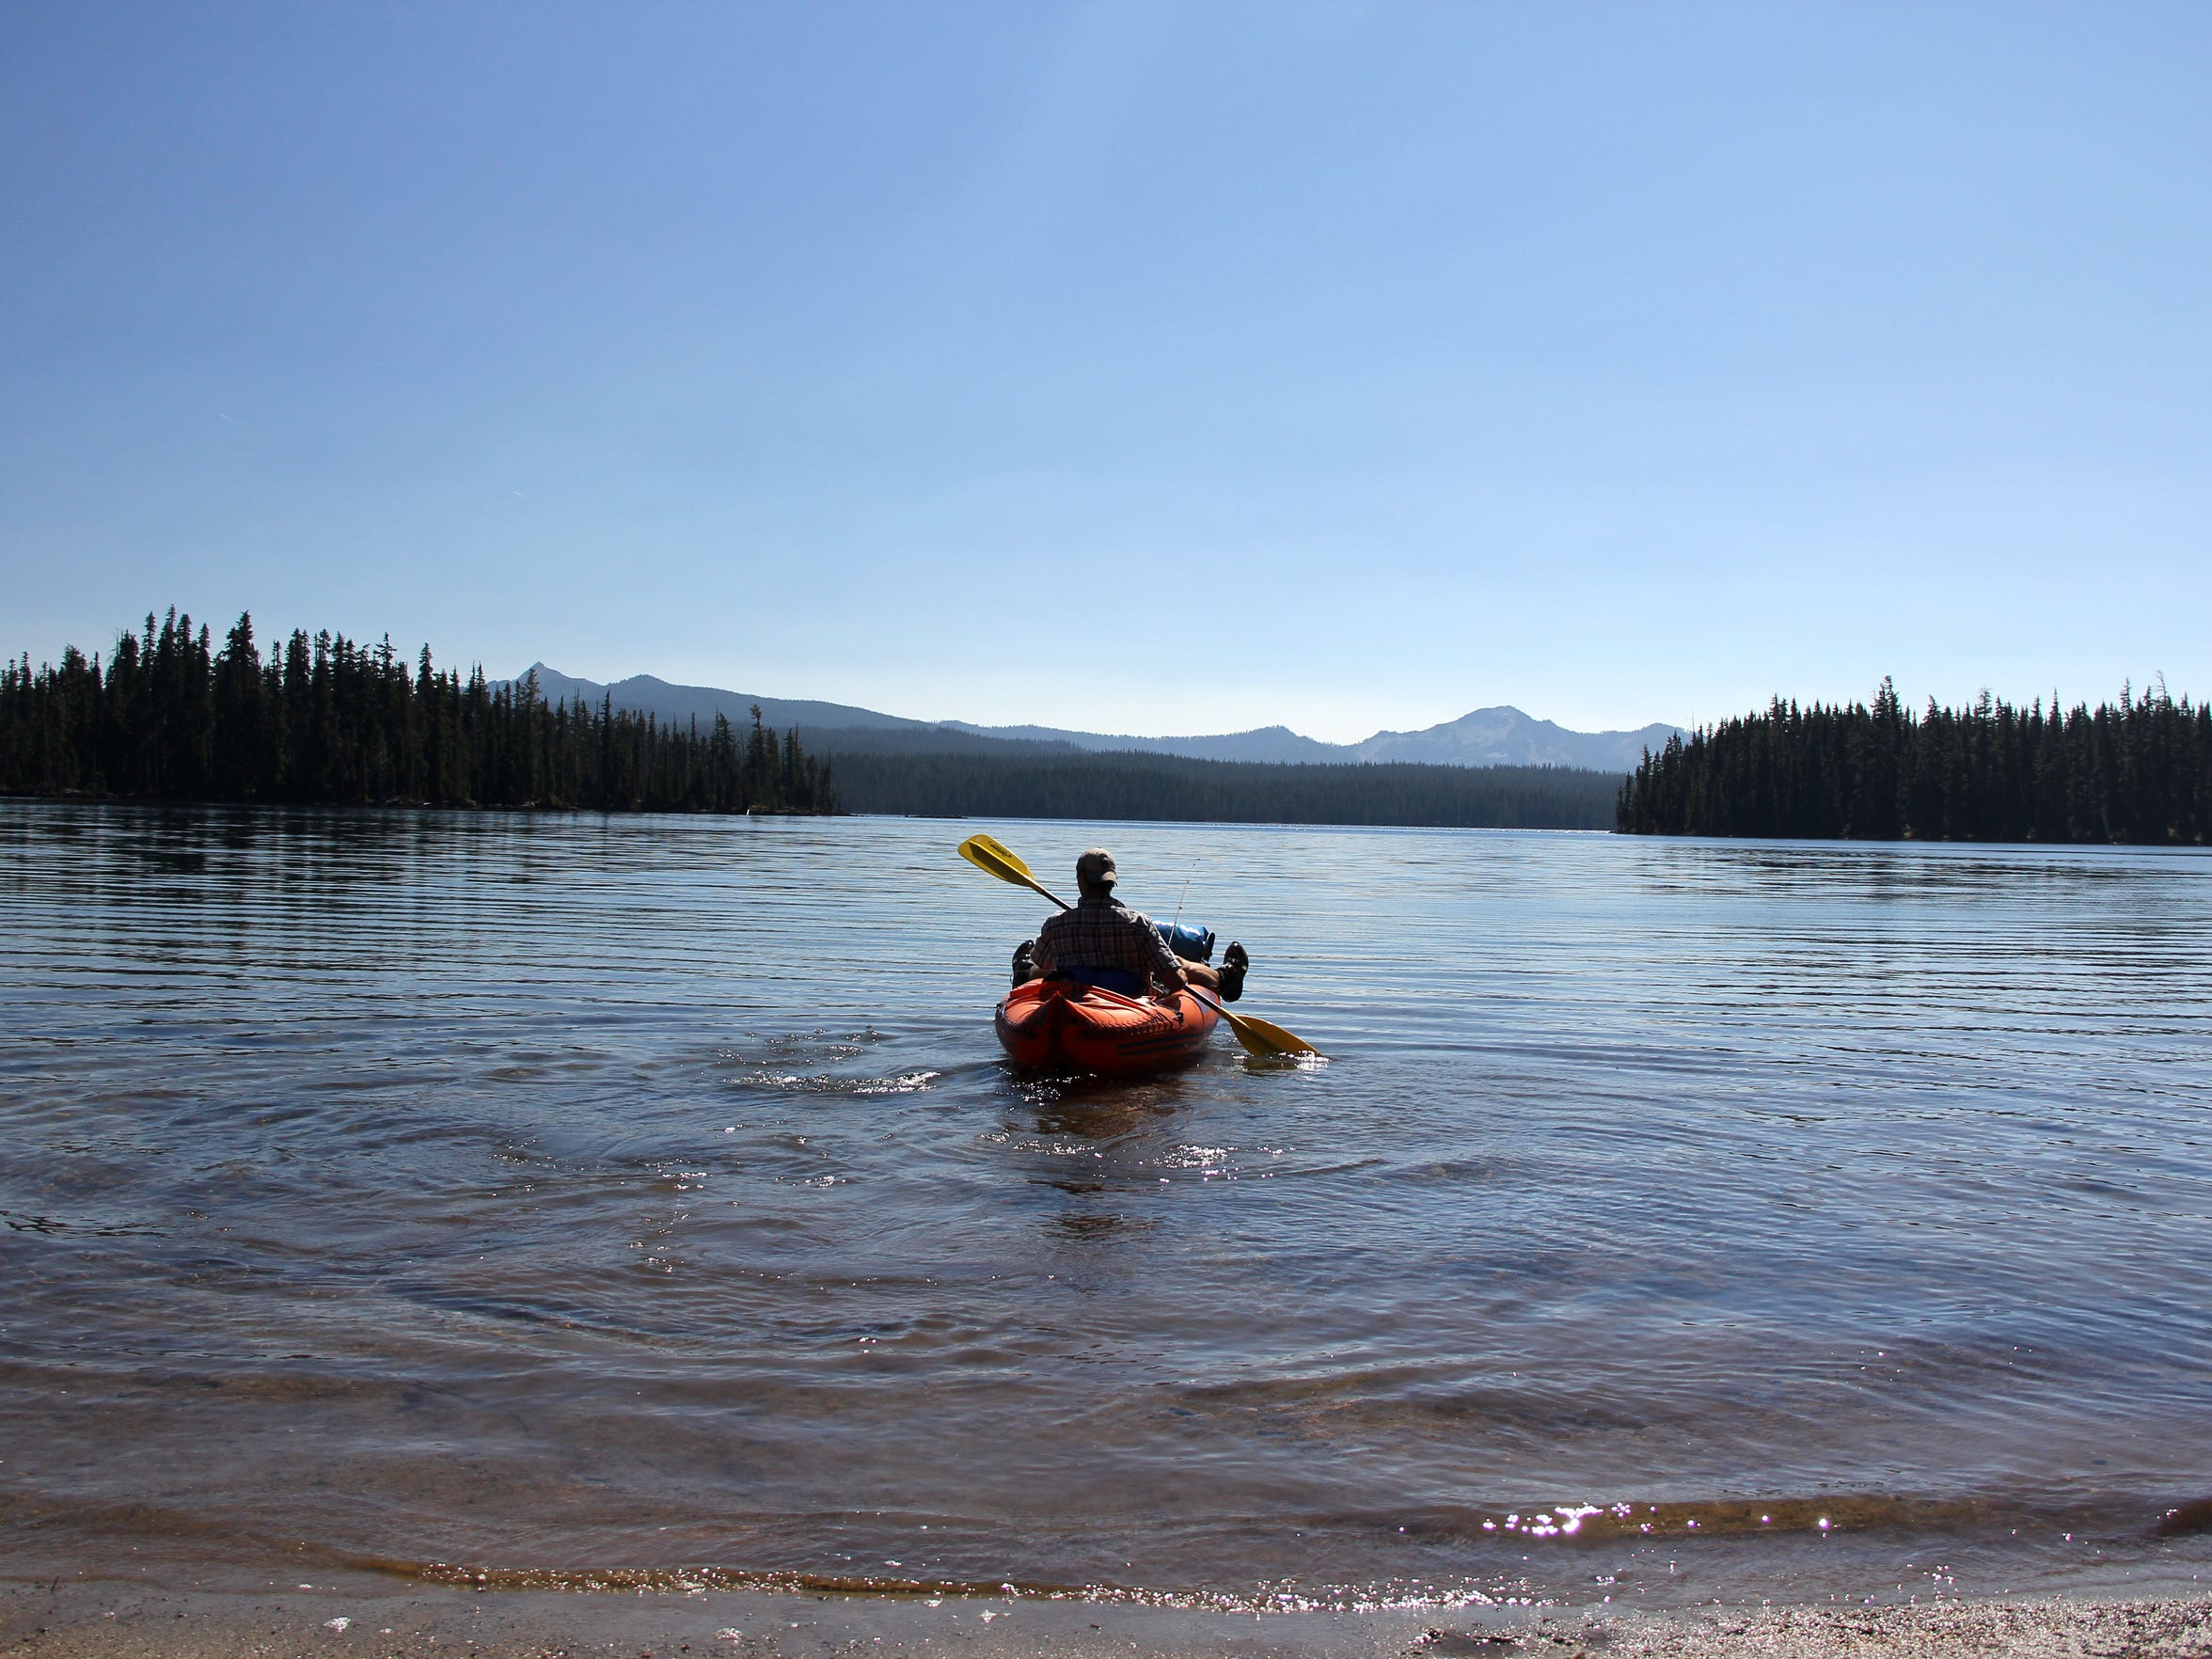 Zach Urness heads off into Summit Lake.